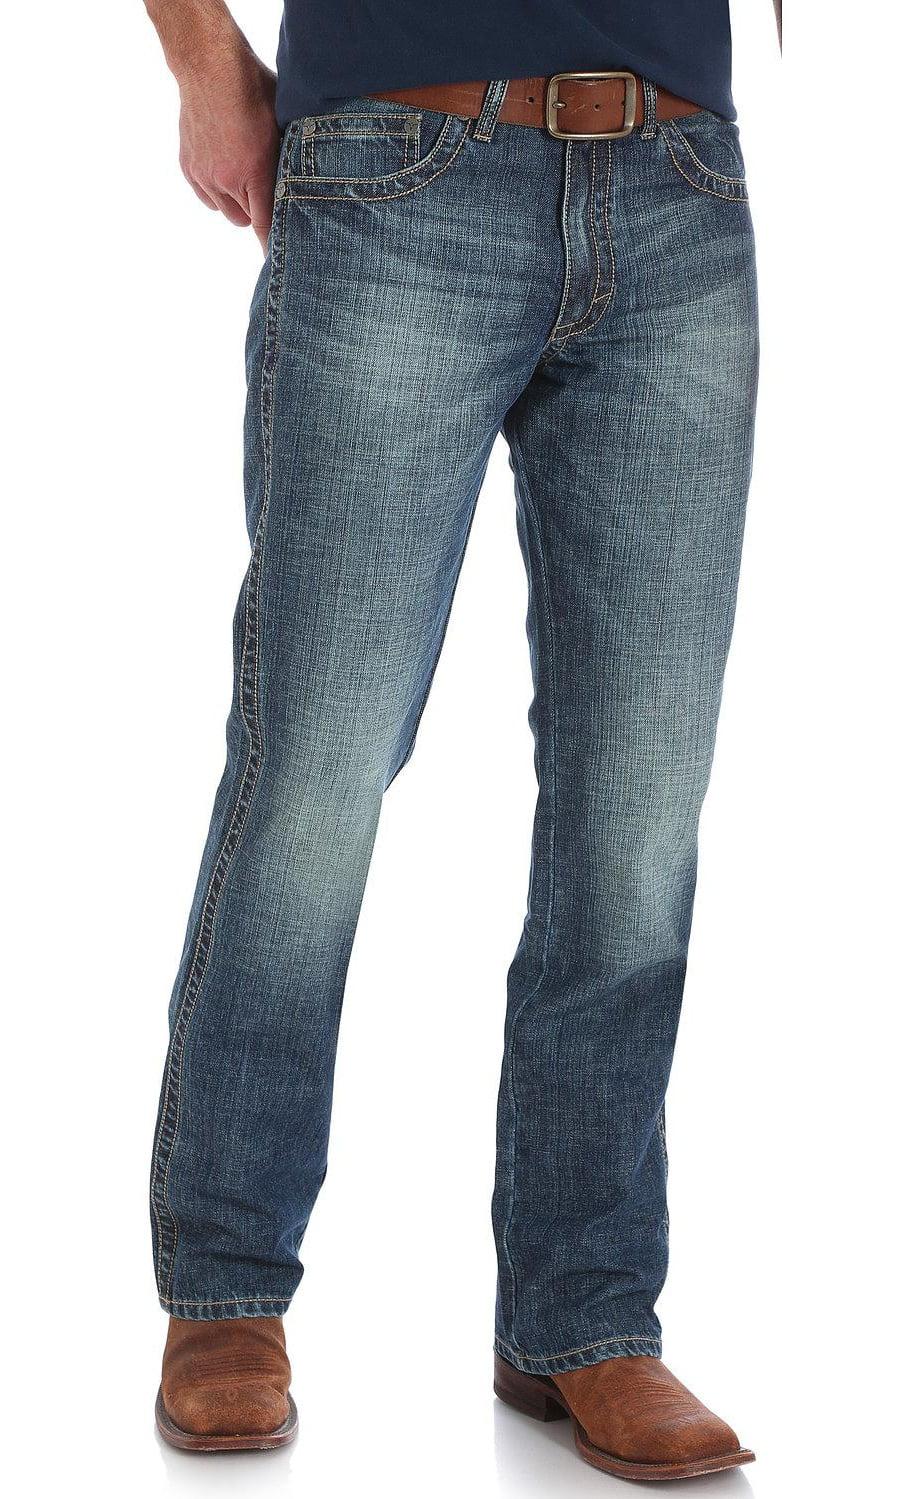 baccf132 Wrangler - Wrangler Men's 20X No. 42 Stampede Vintage Slim Jeans ...